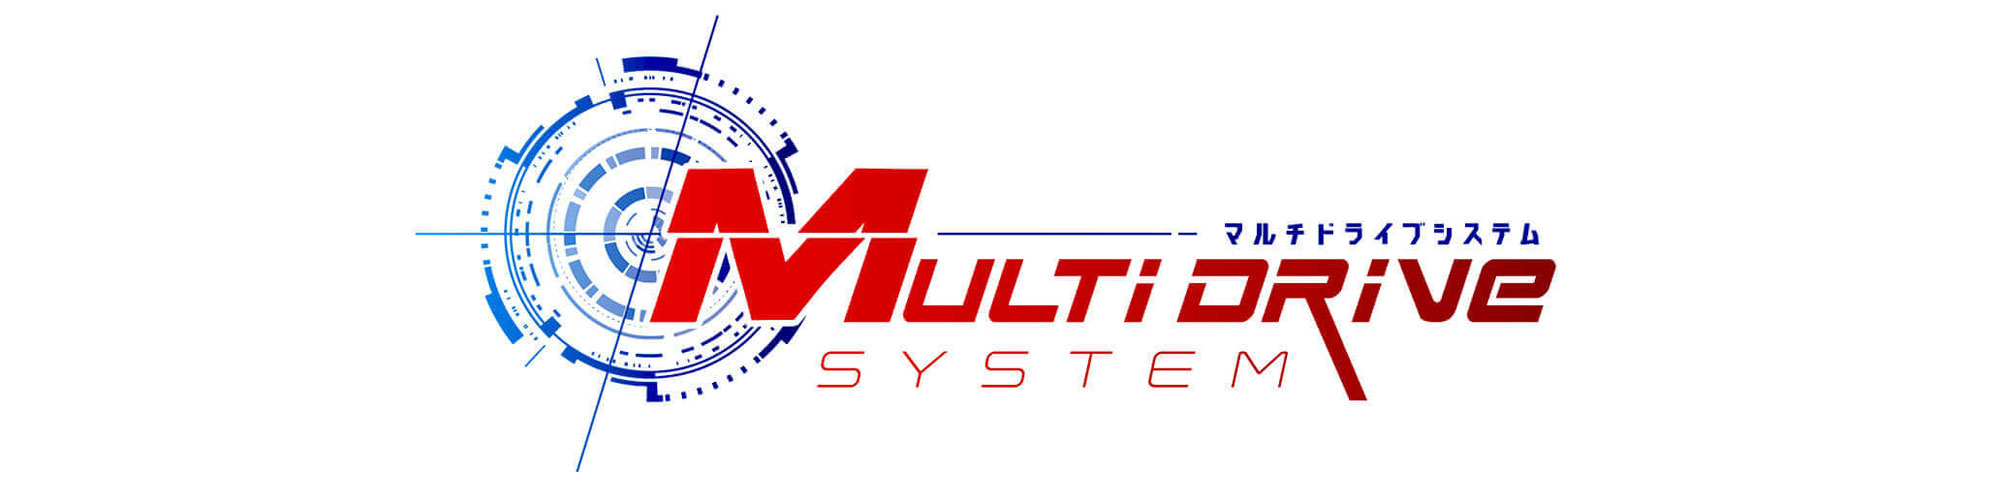 FX自動売買ツールマルチドライブシステムの概要